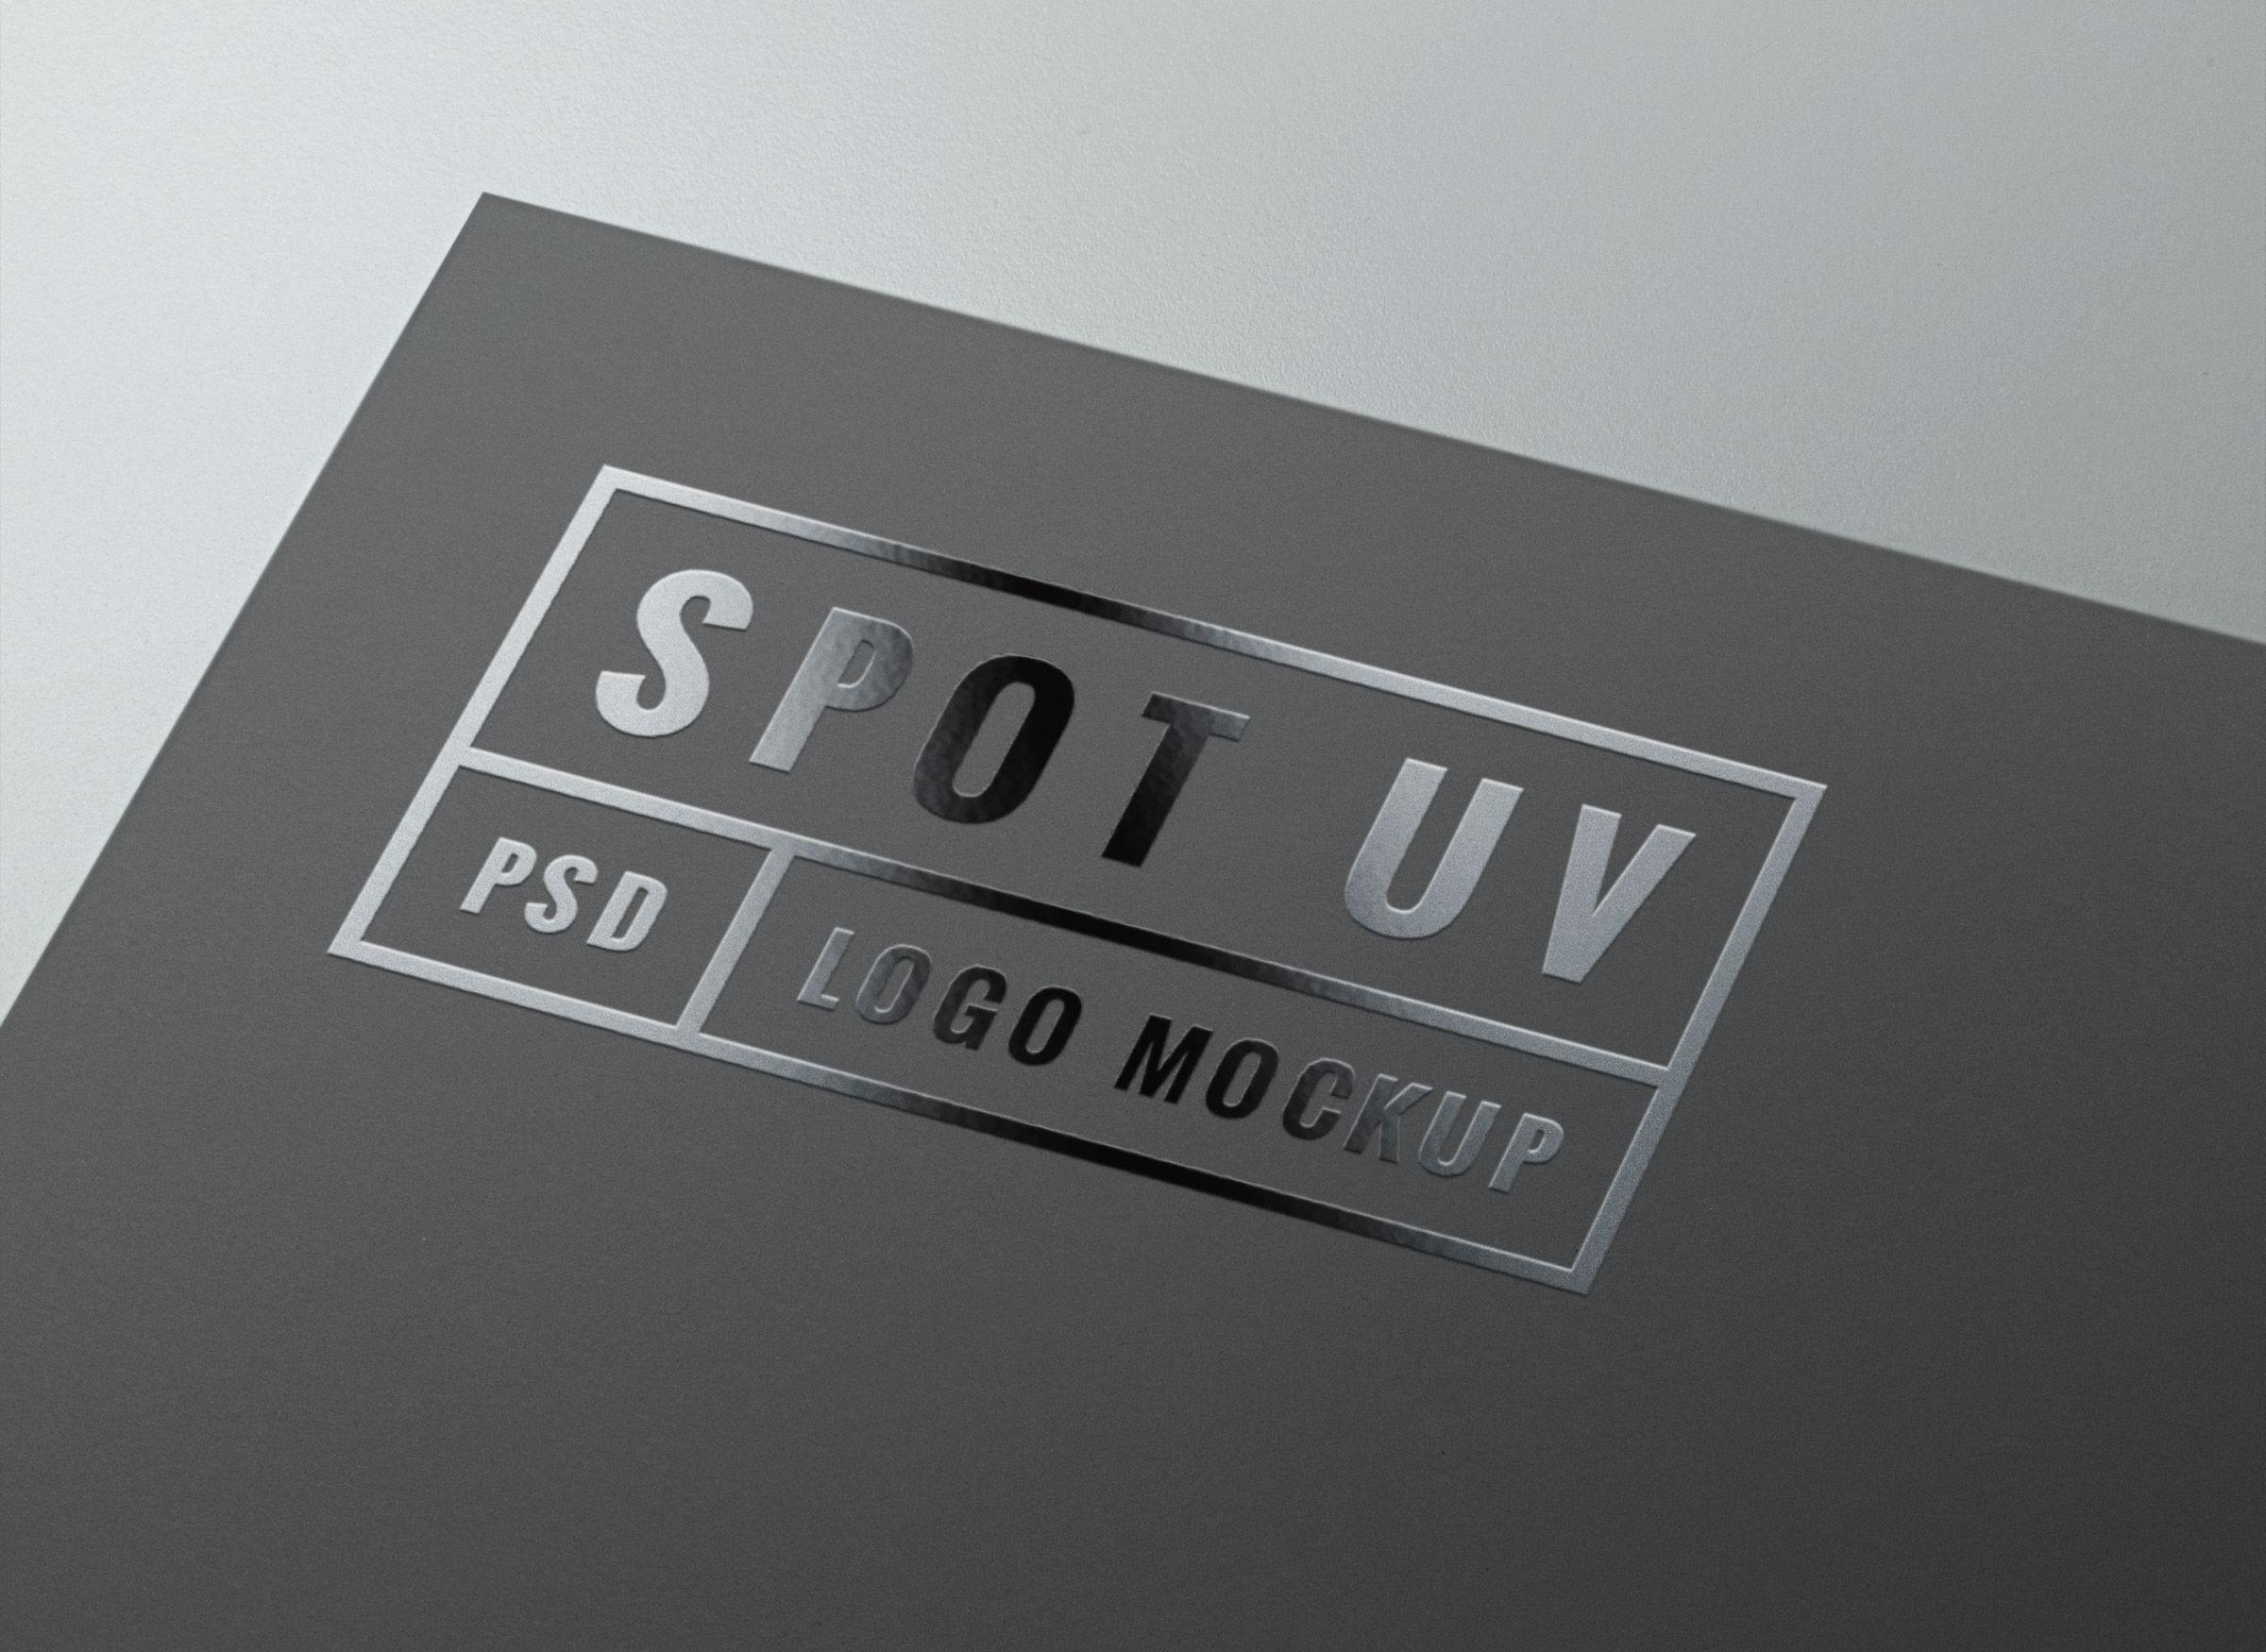 Spot Uv Light Card Spo...